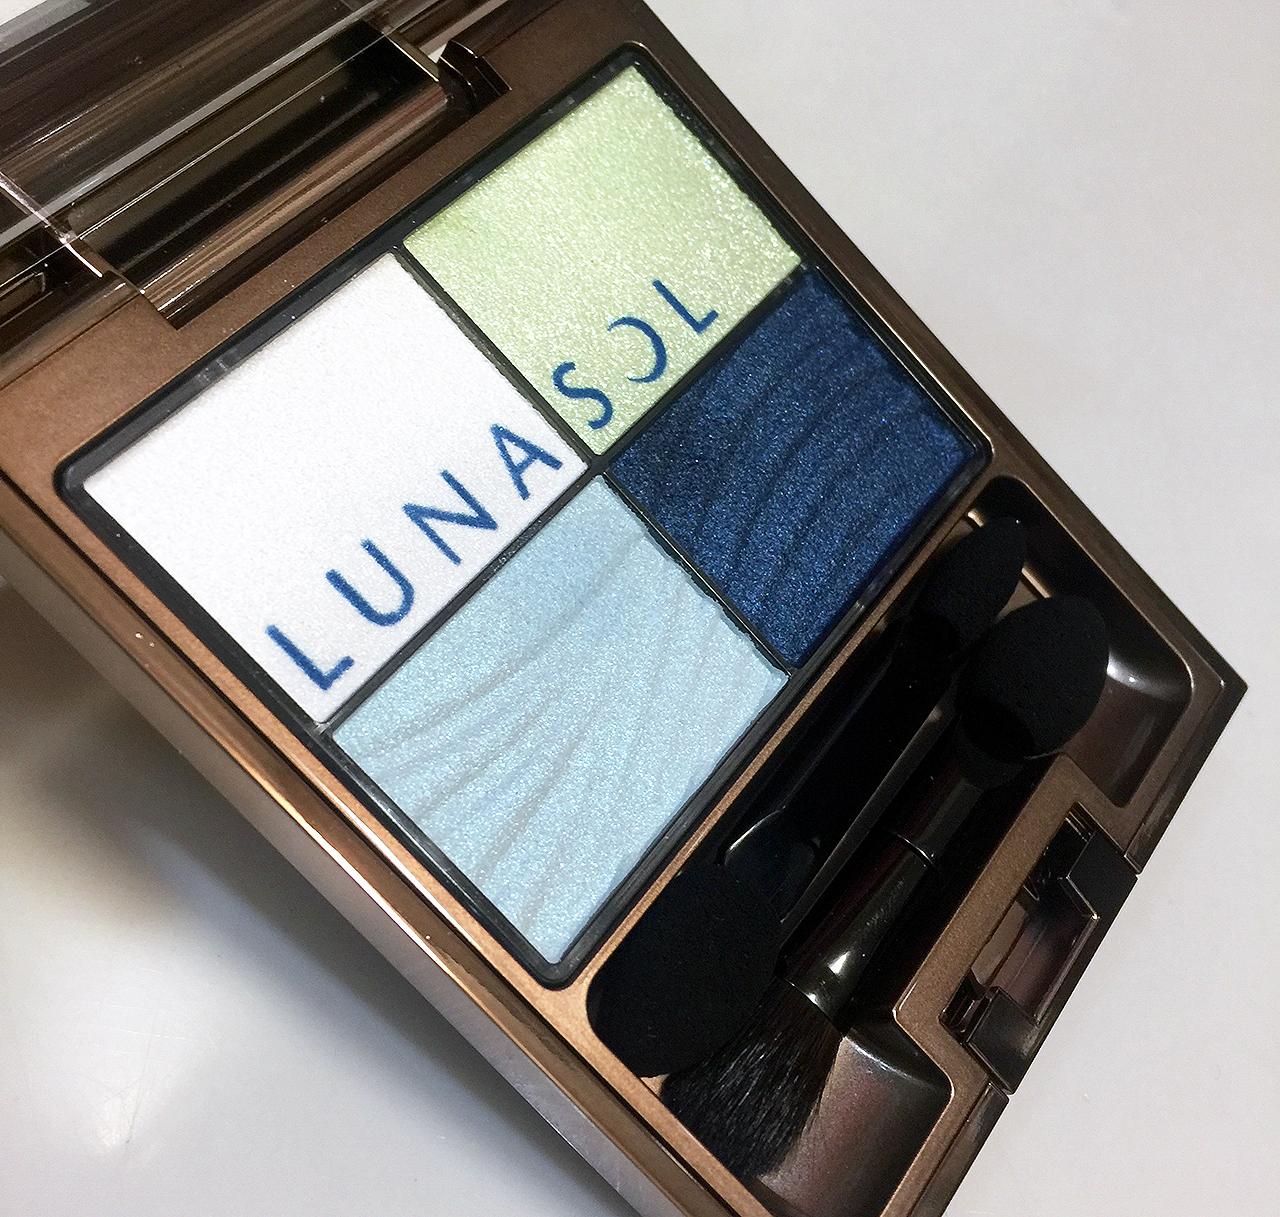 Lunasol Clear Colorful Eyes EX01 Ocean Lagoon from Summer 2016